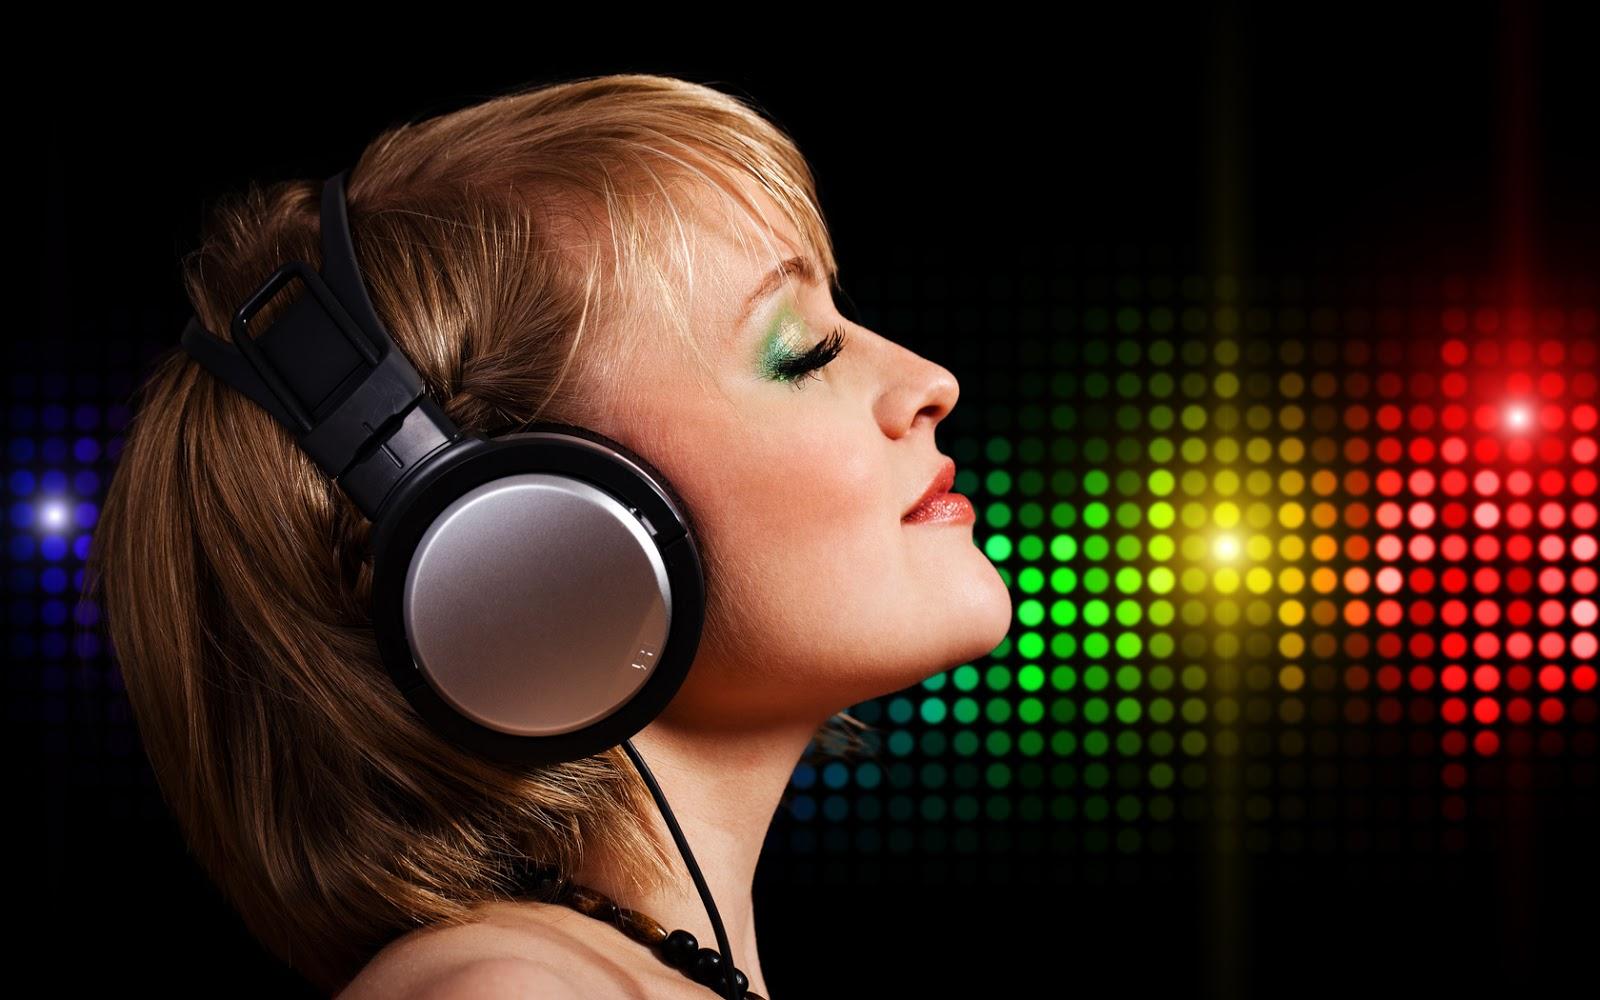 http://4.bp.blogspot.com/-S3W-QoG_83k/UOLz2uIZdbI/AAAAAAAAB4U/veWxXz3rC-g/s1600/Girls%2BHD%2BDesktop%2BWallpaper.jpg